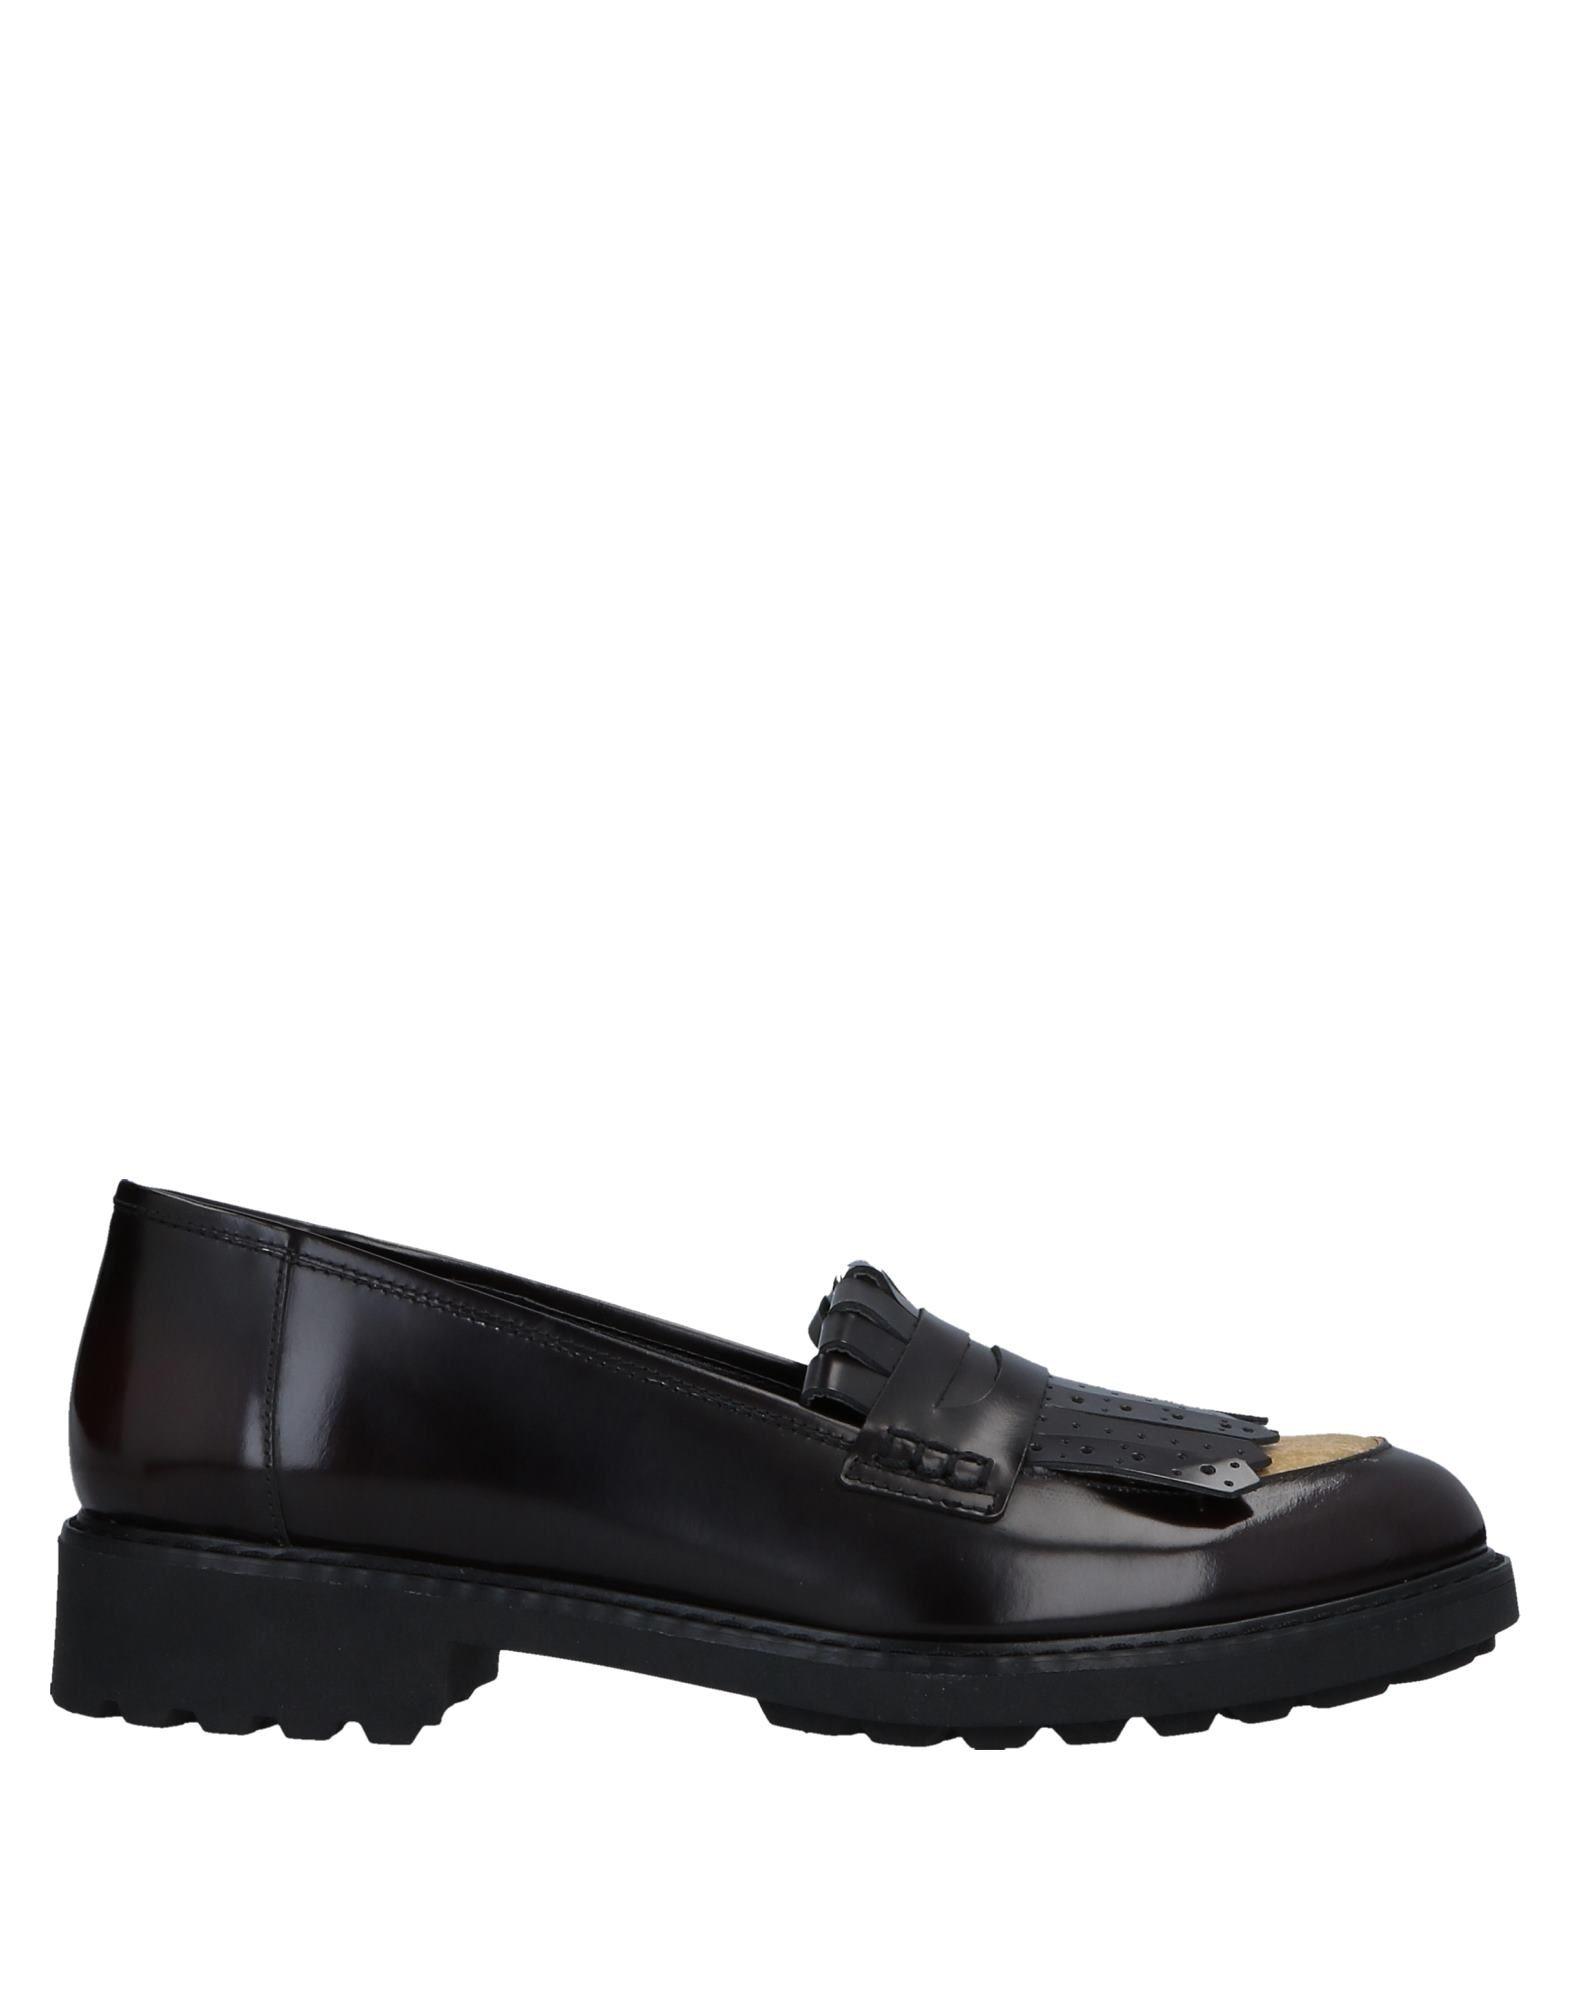 Alviero Martini 1A Classe Mokassins Damen  11517084AQ Gute Qualität beliebte Schuhe